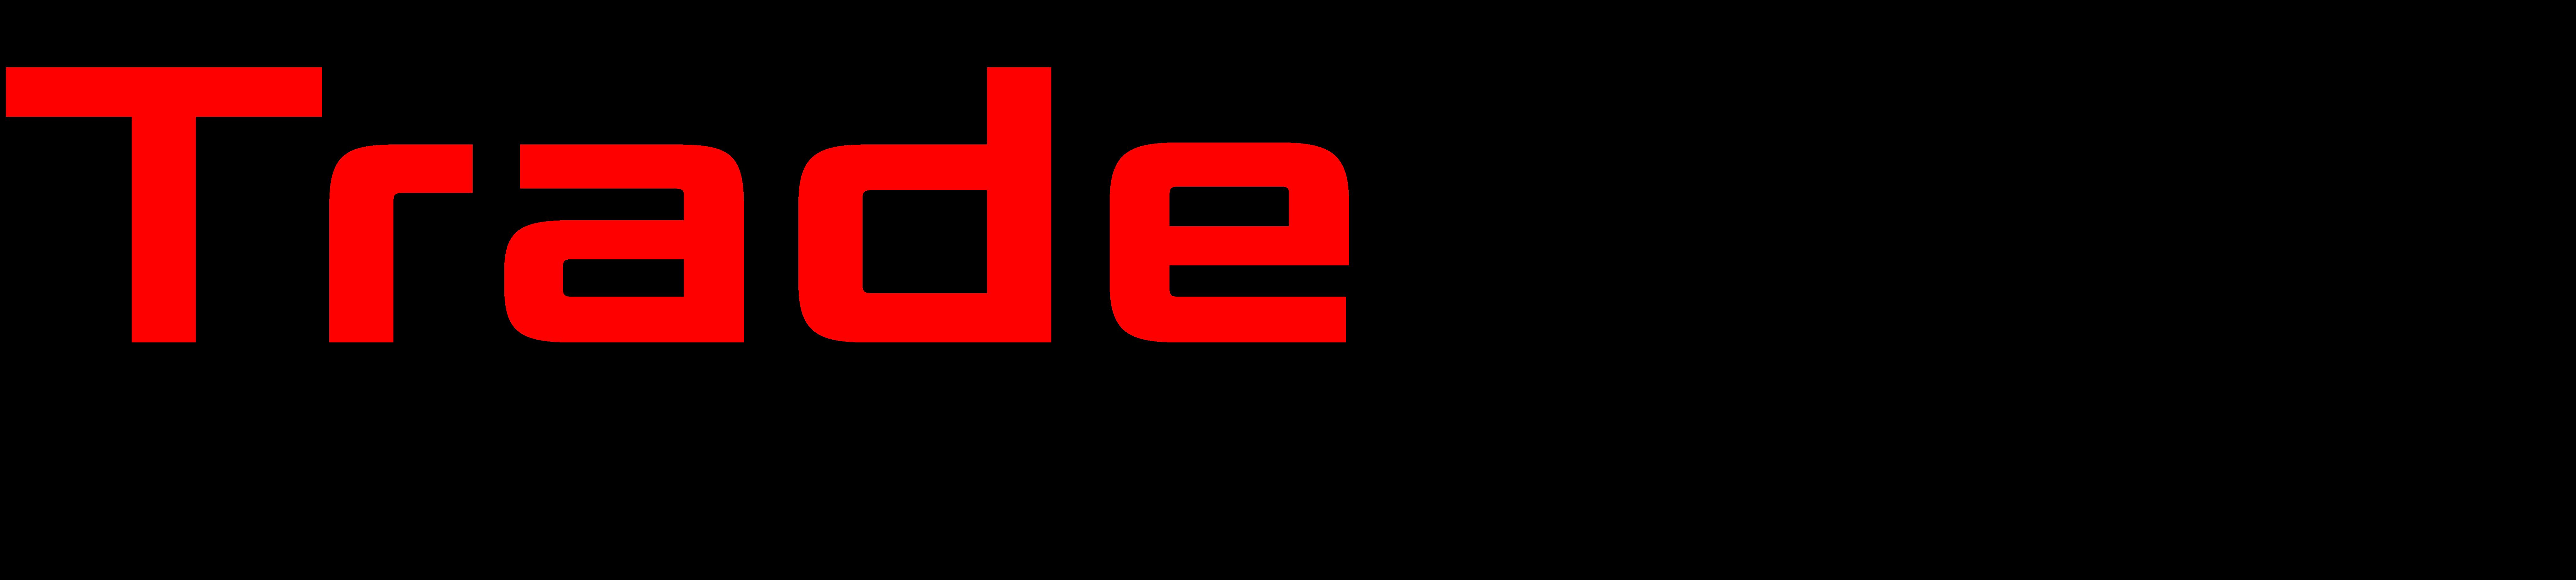 Trade Van Accessories logo